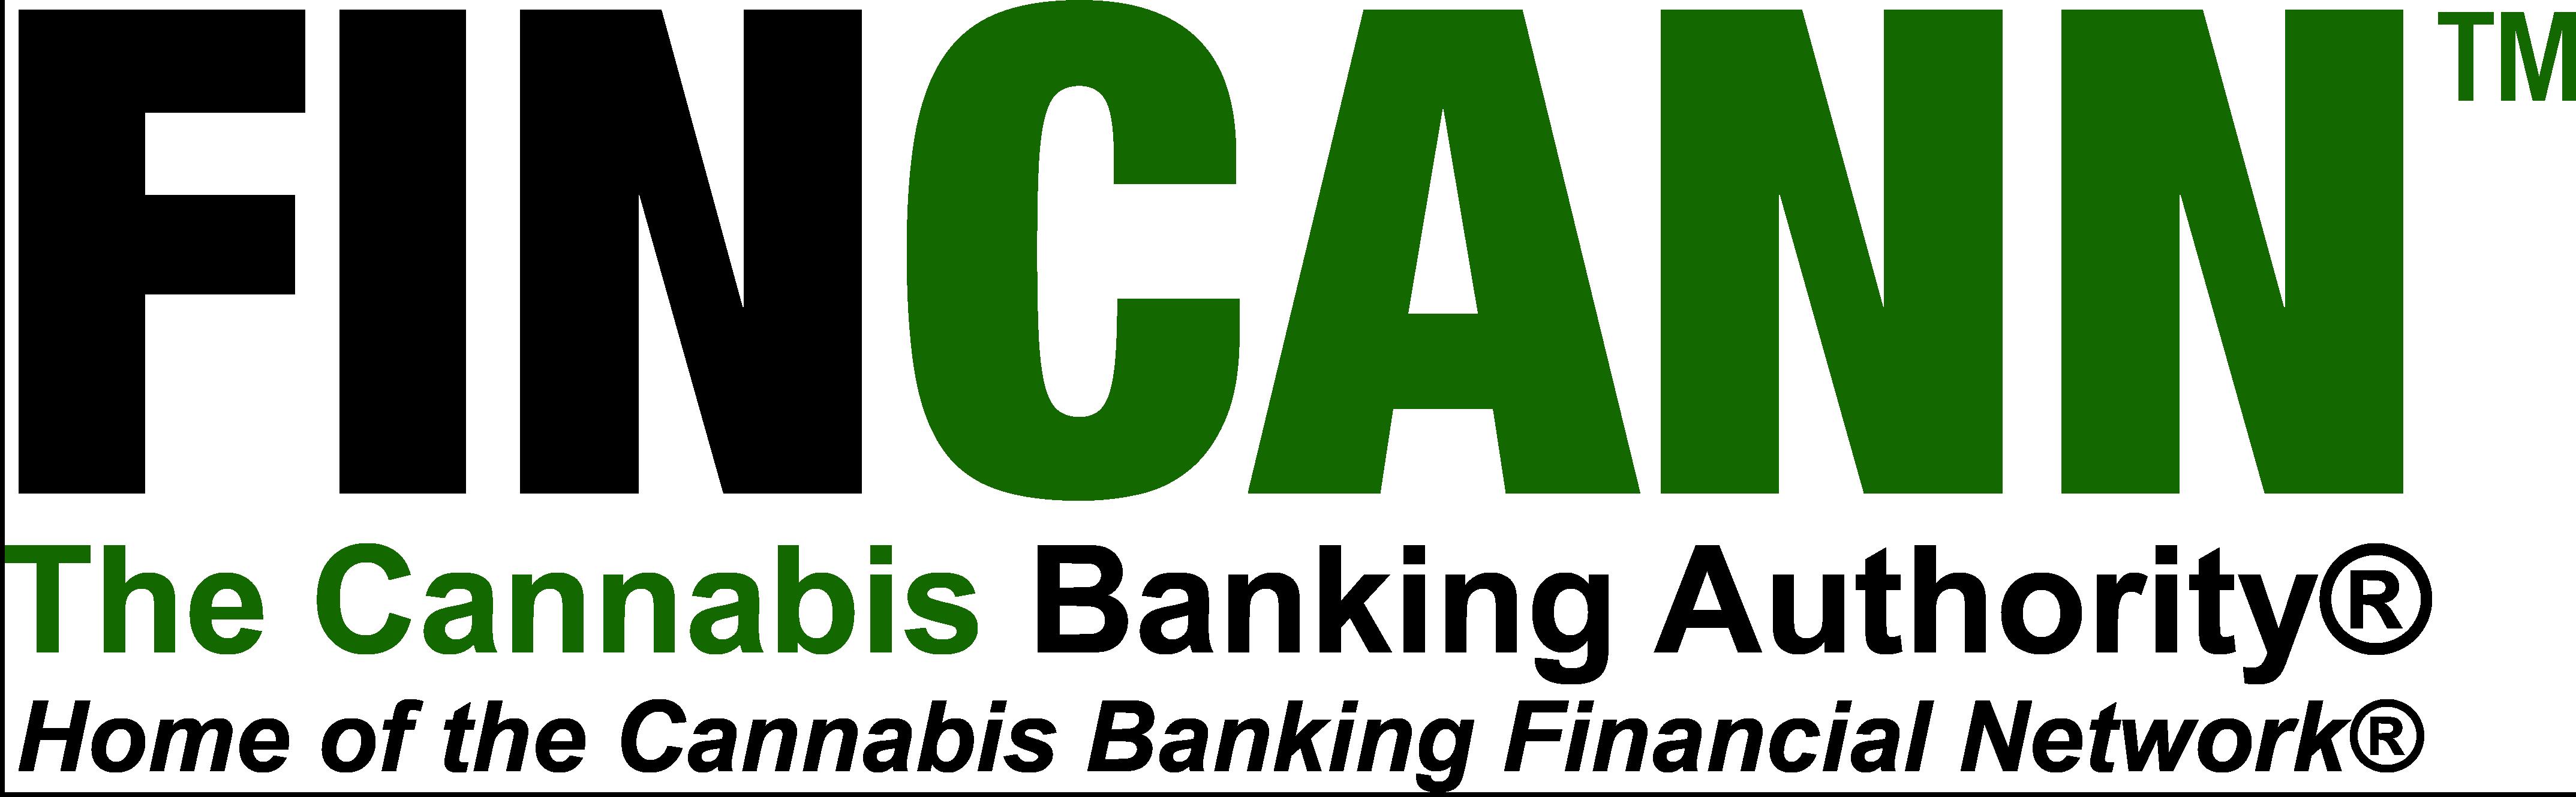 fincann-logo_V3